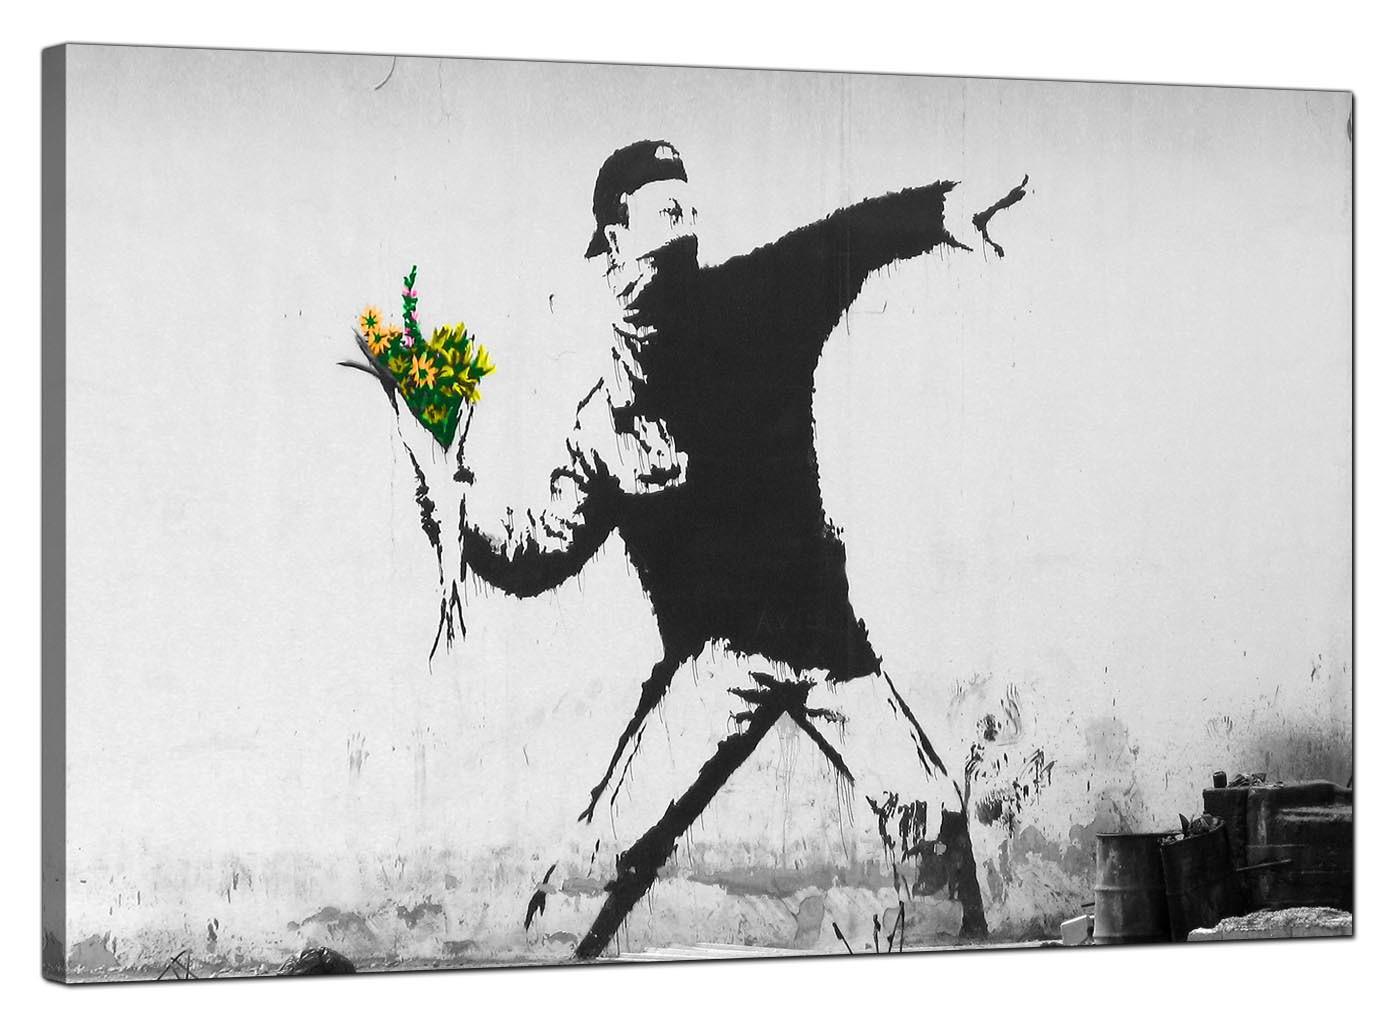 buy sofa bed new york australia online banksy canvas prints - flower thrower